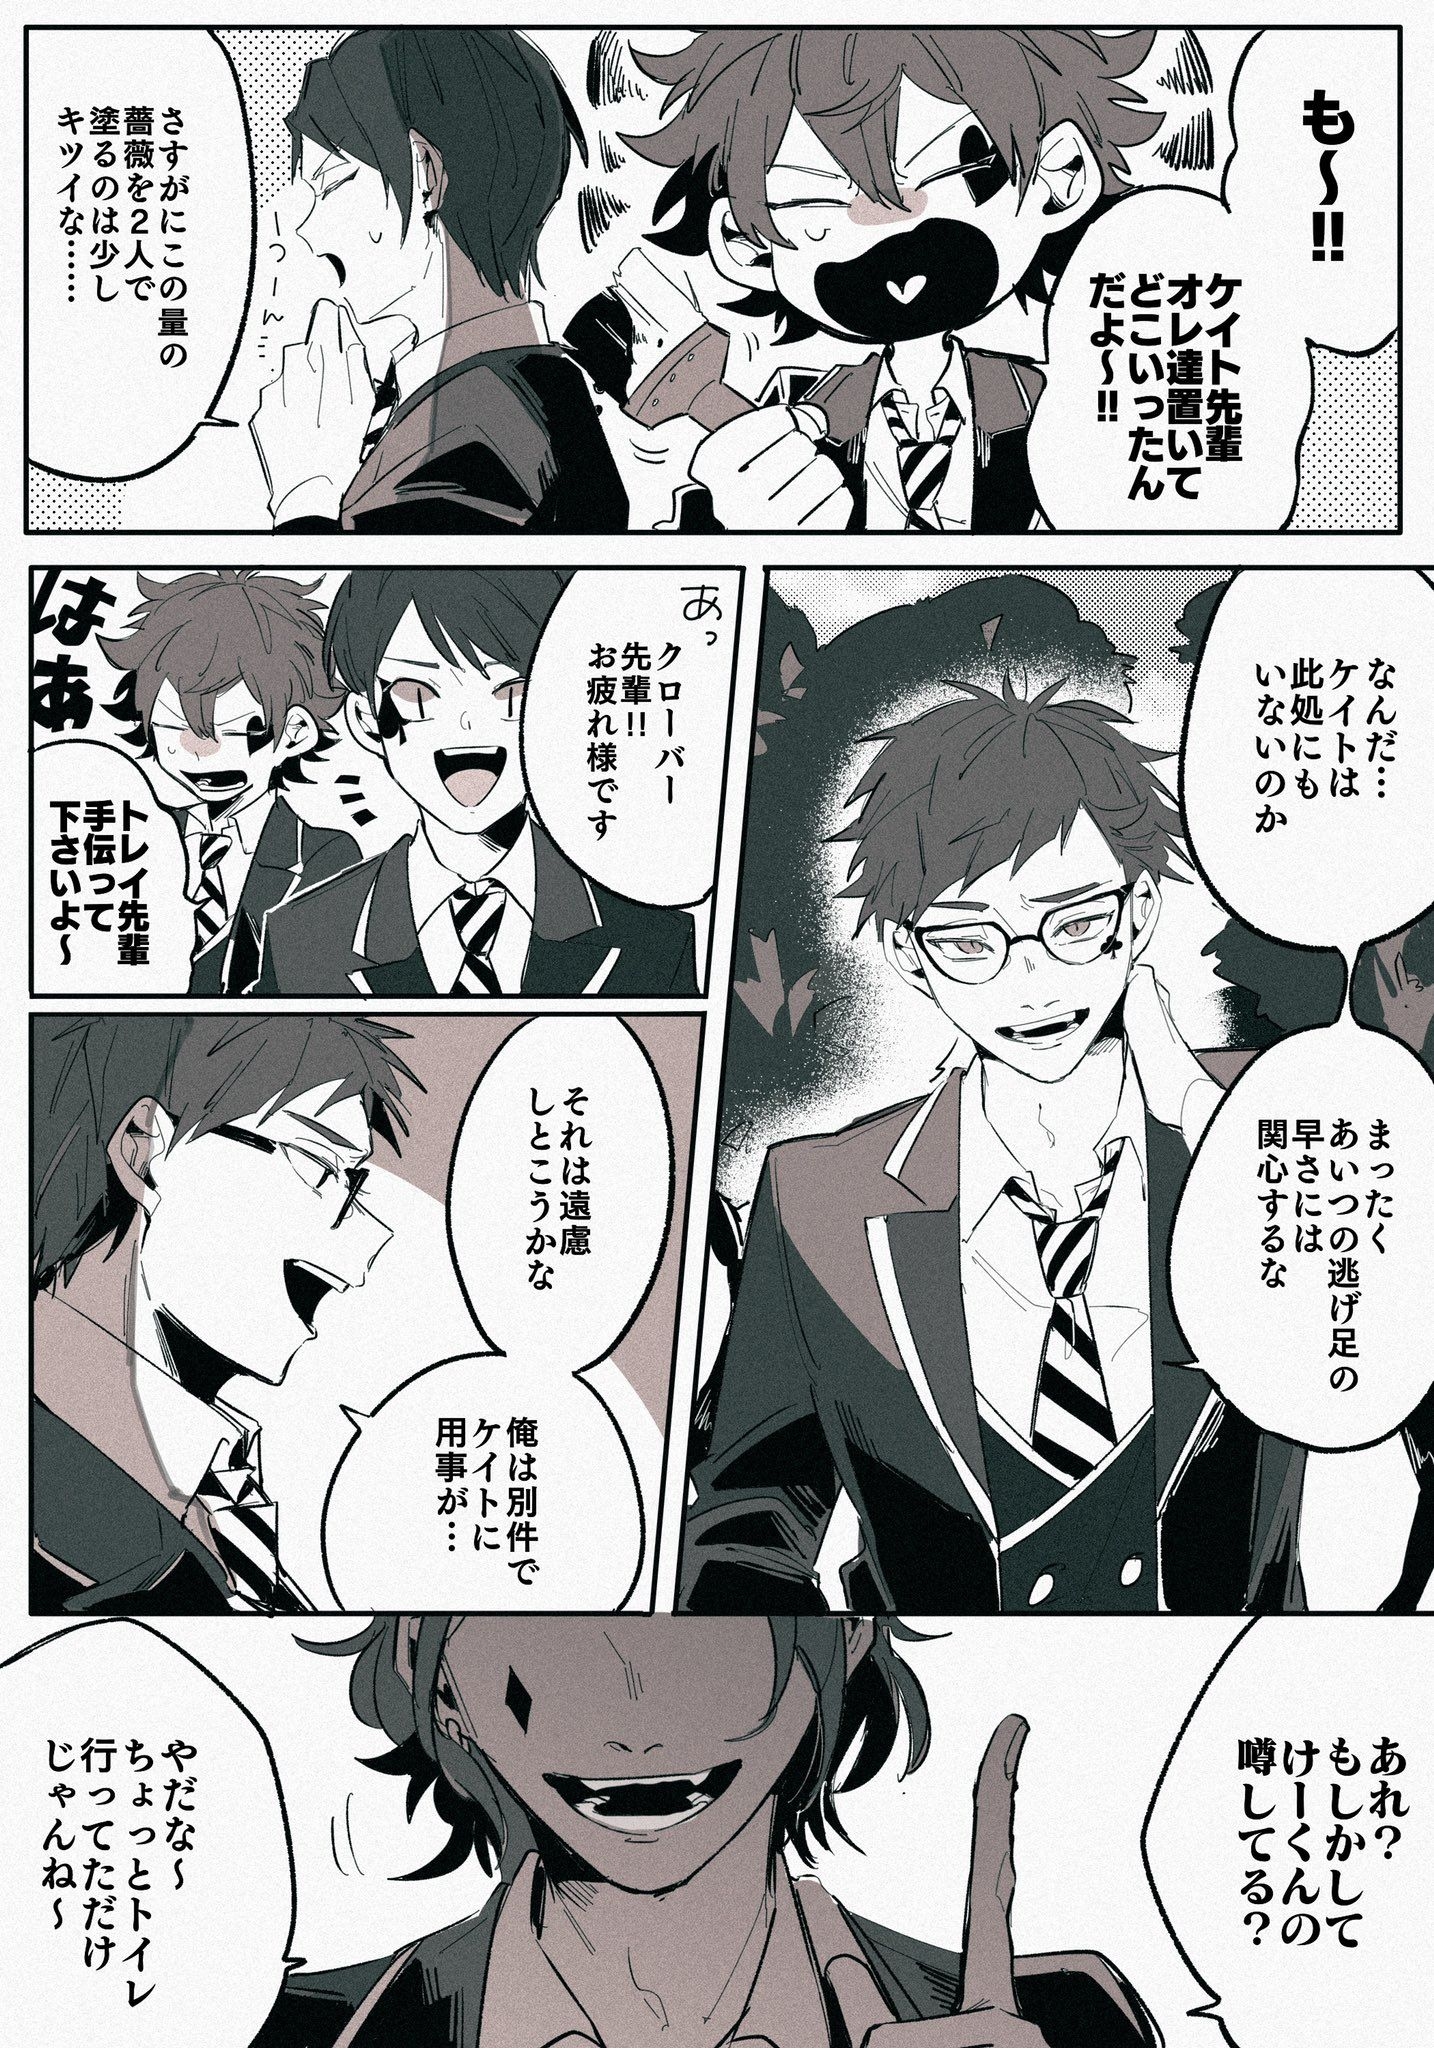 ʀᴀᴠ on twitter 漫画 ツイ ディズニーファンアート